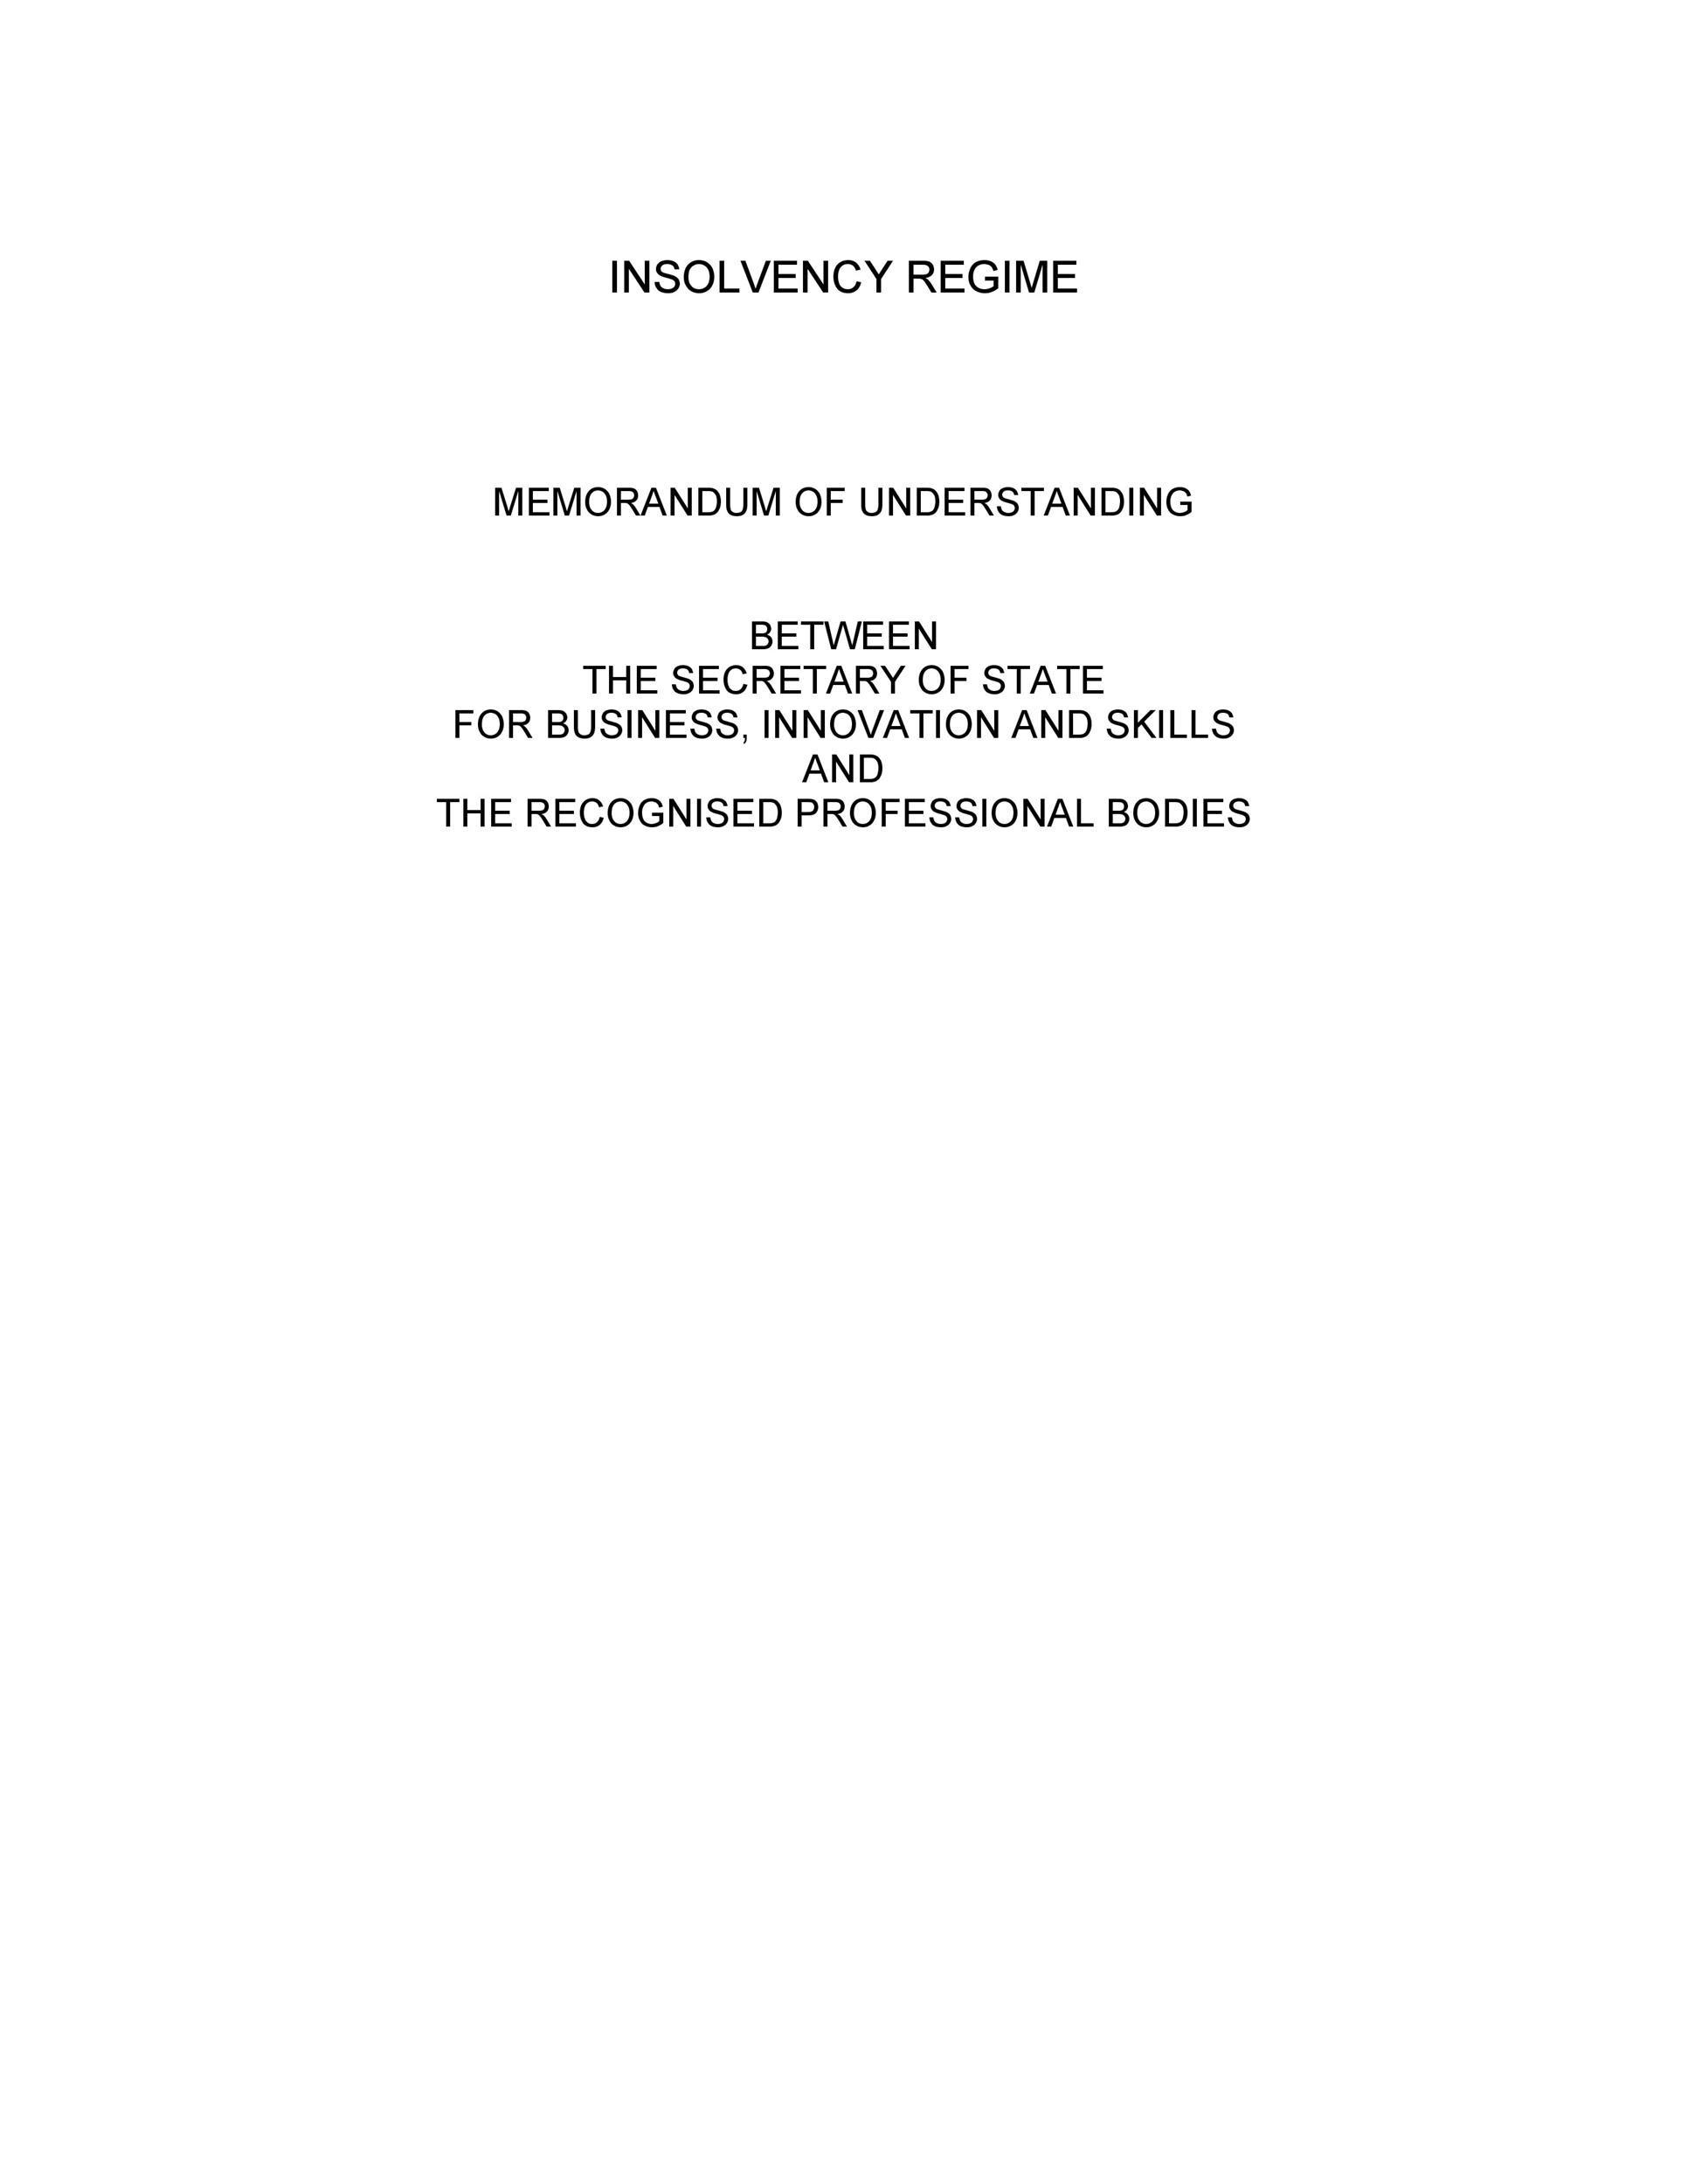 Free Memorandum of Understanding Template 47